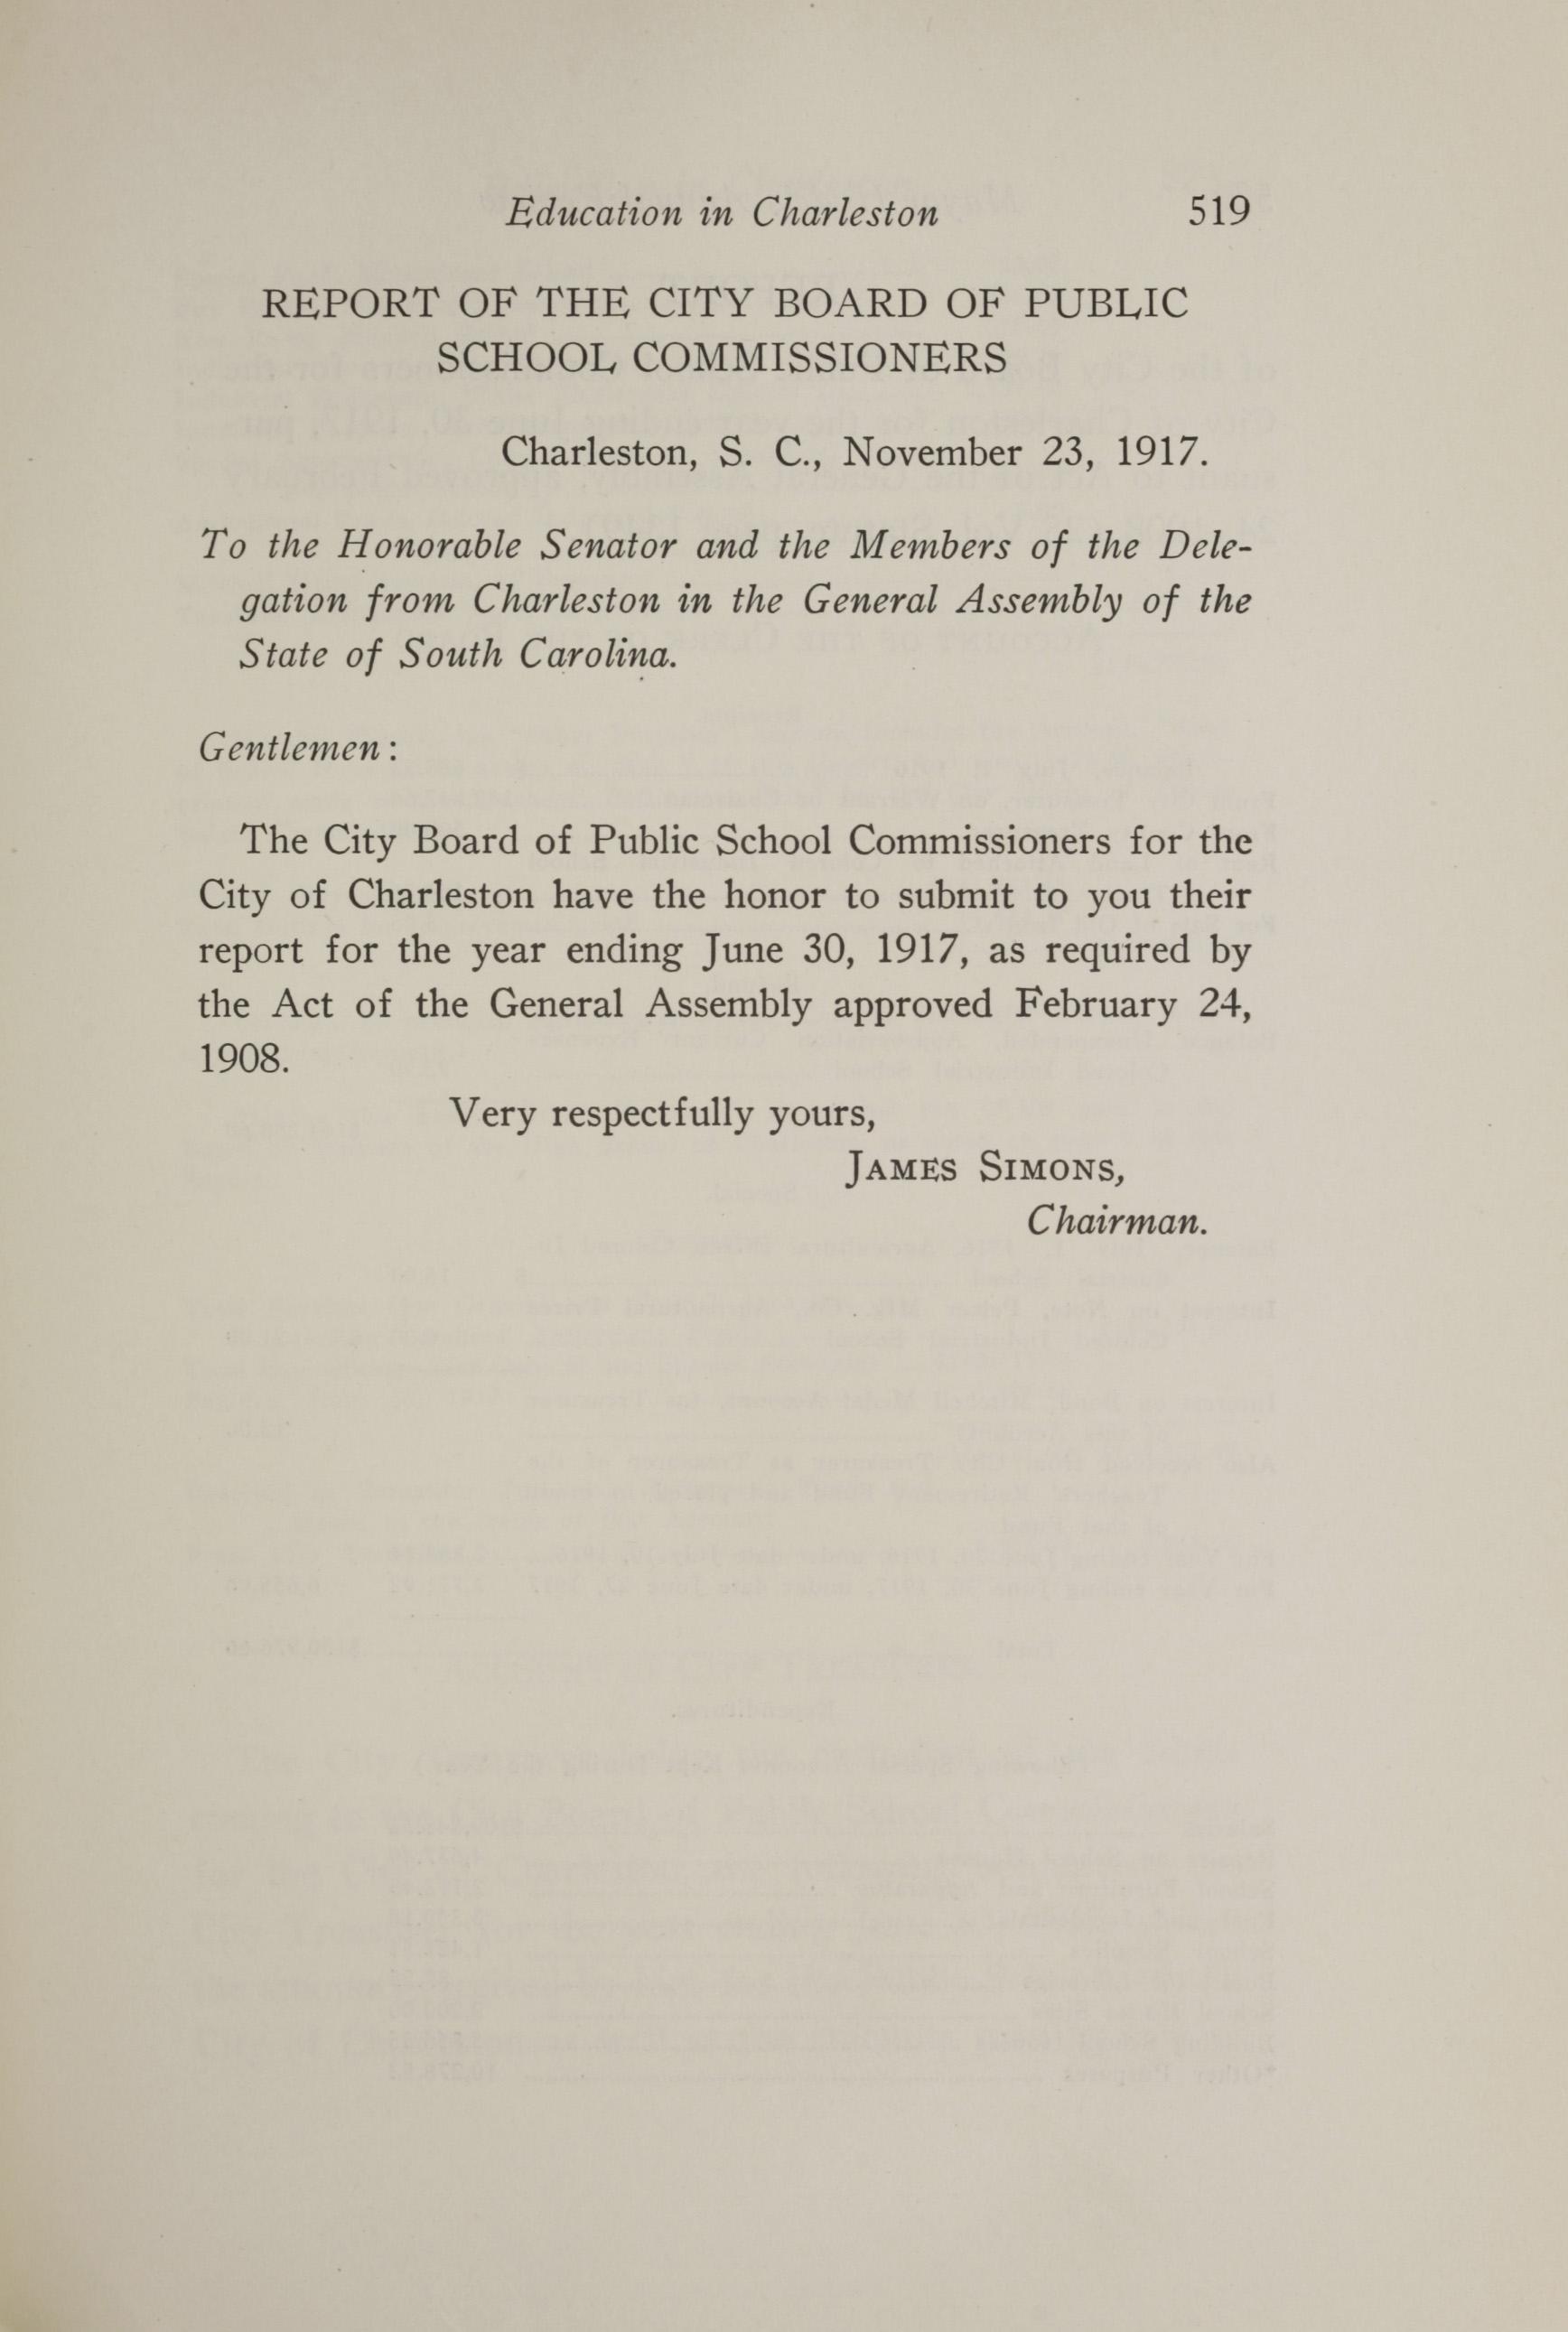 Charleston Yearbook, 1917, page 519